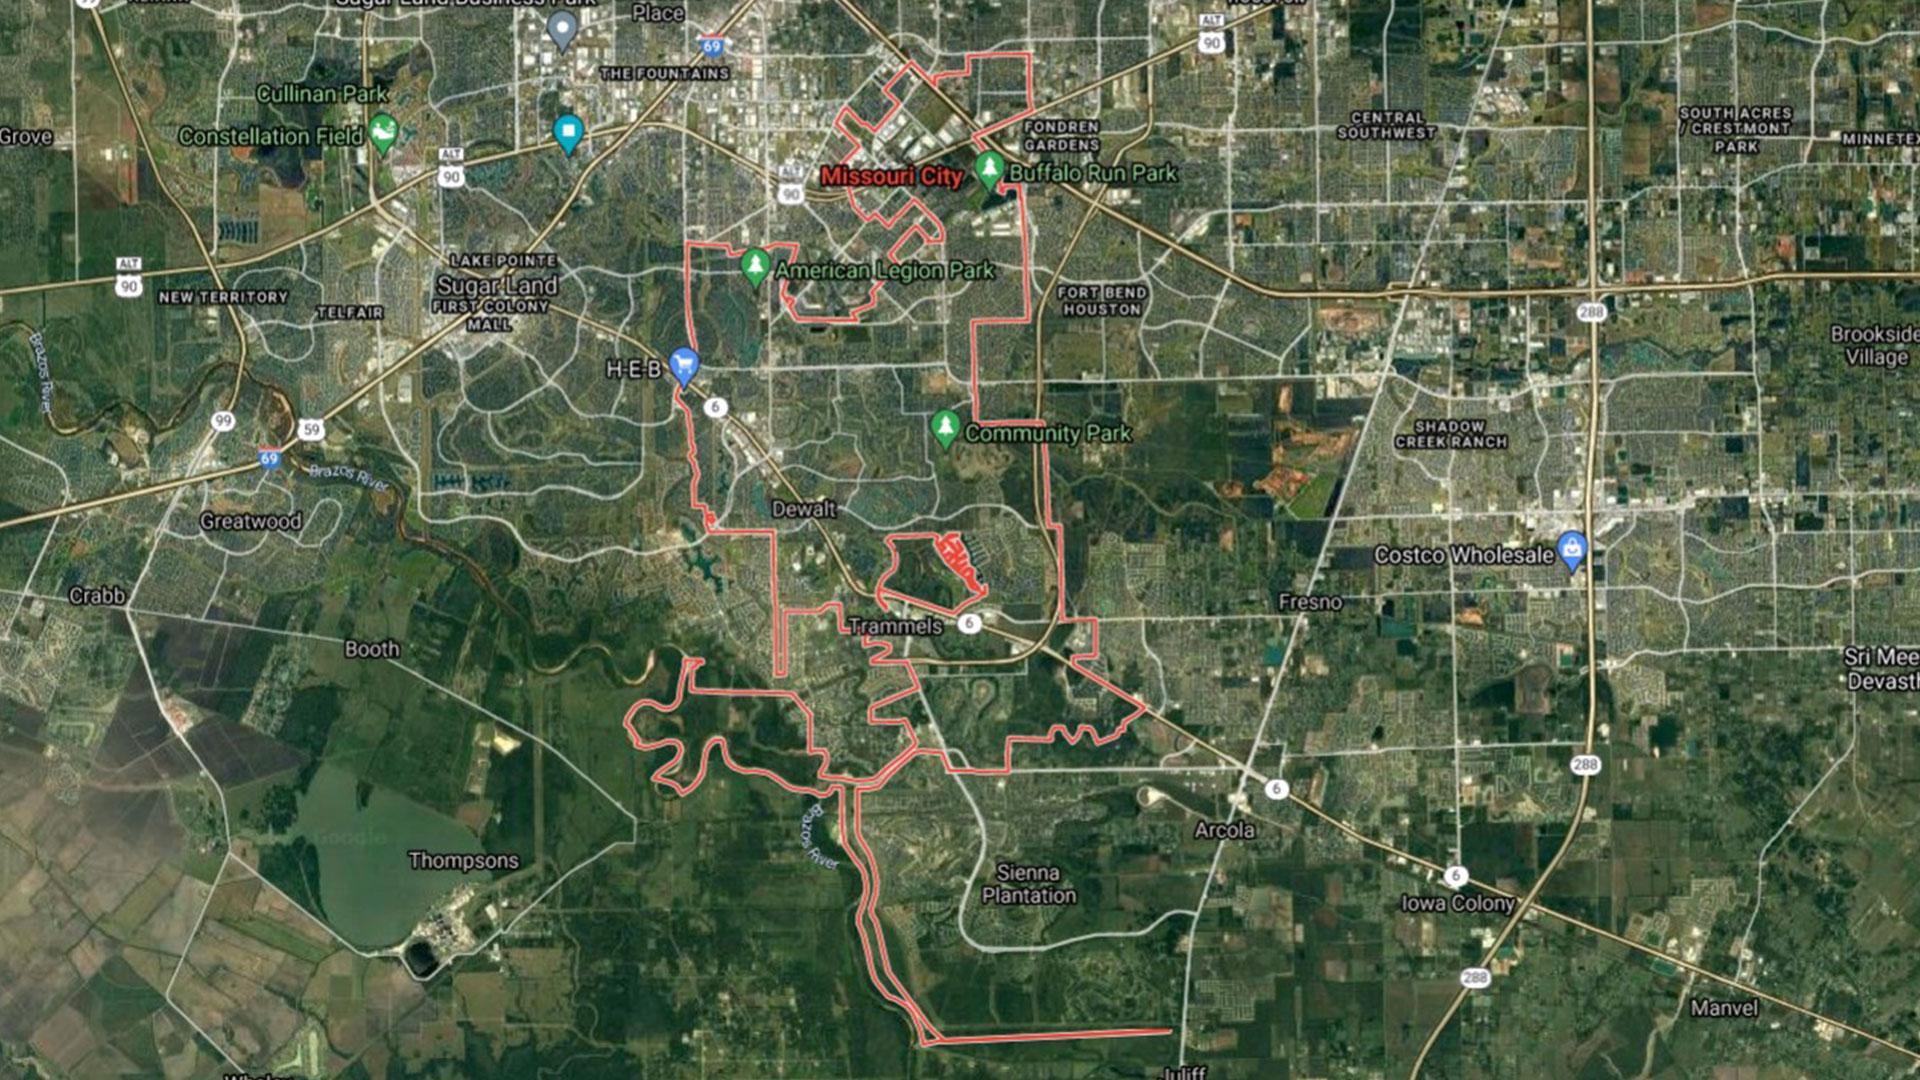 West-Houston-Neighborhood---MISSOURI-CITY